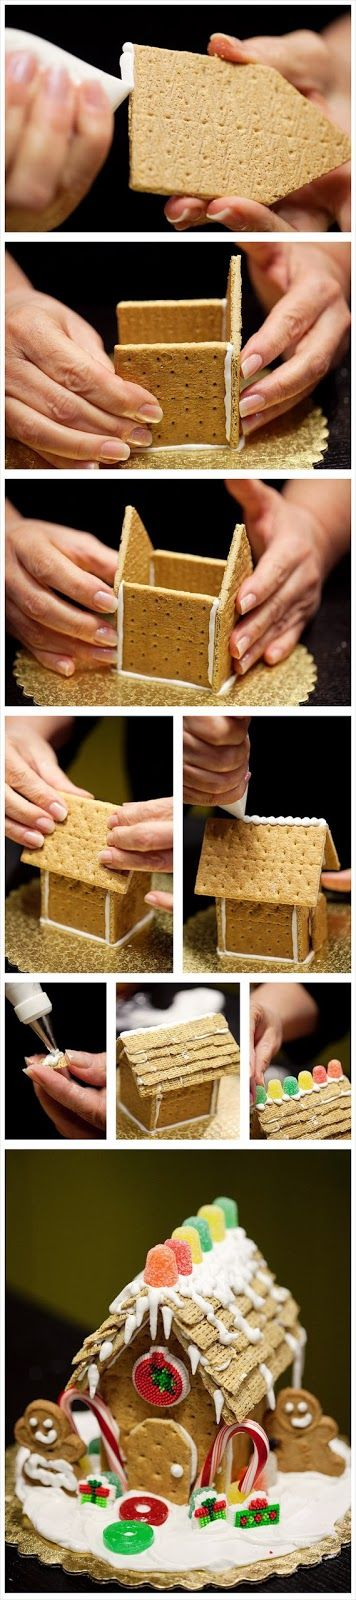 Easy DIY Crafts: DIY Cute Gingerbread House